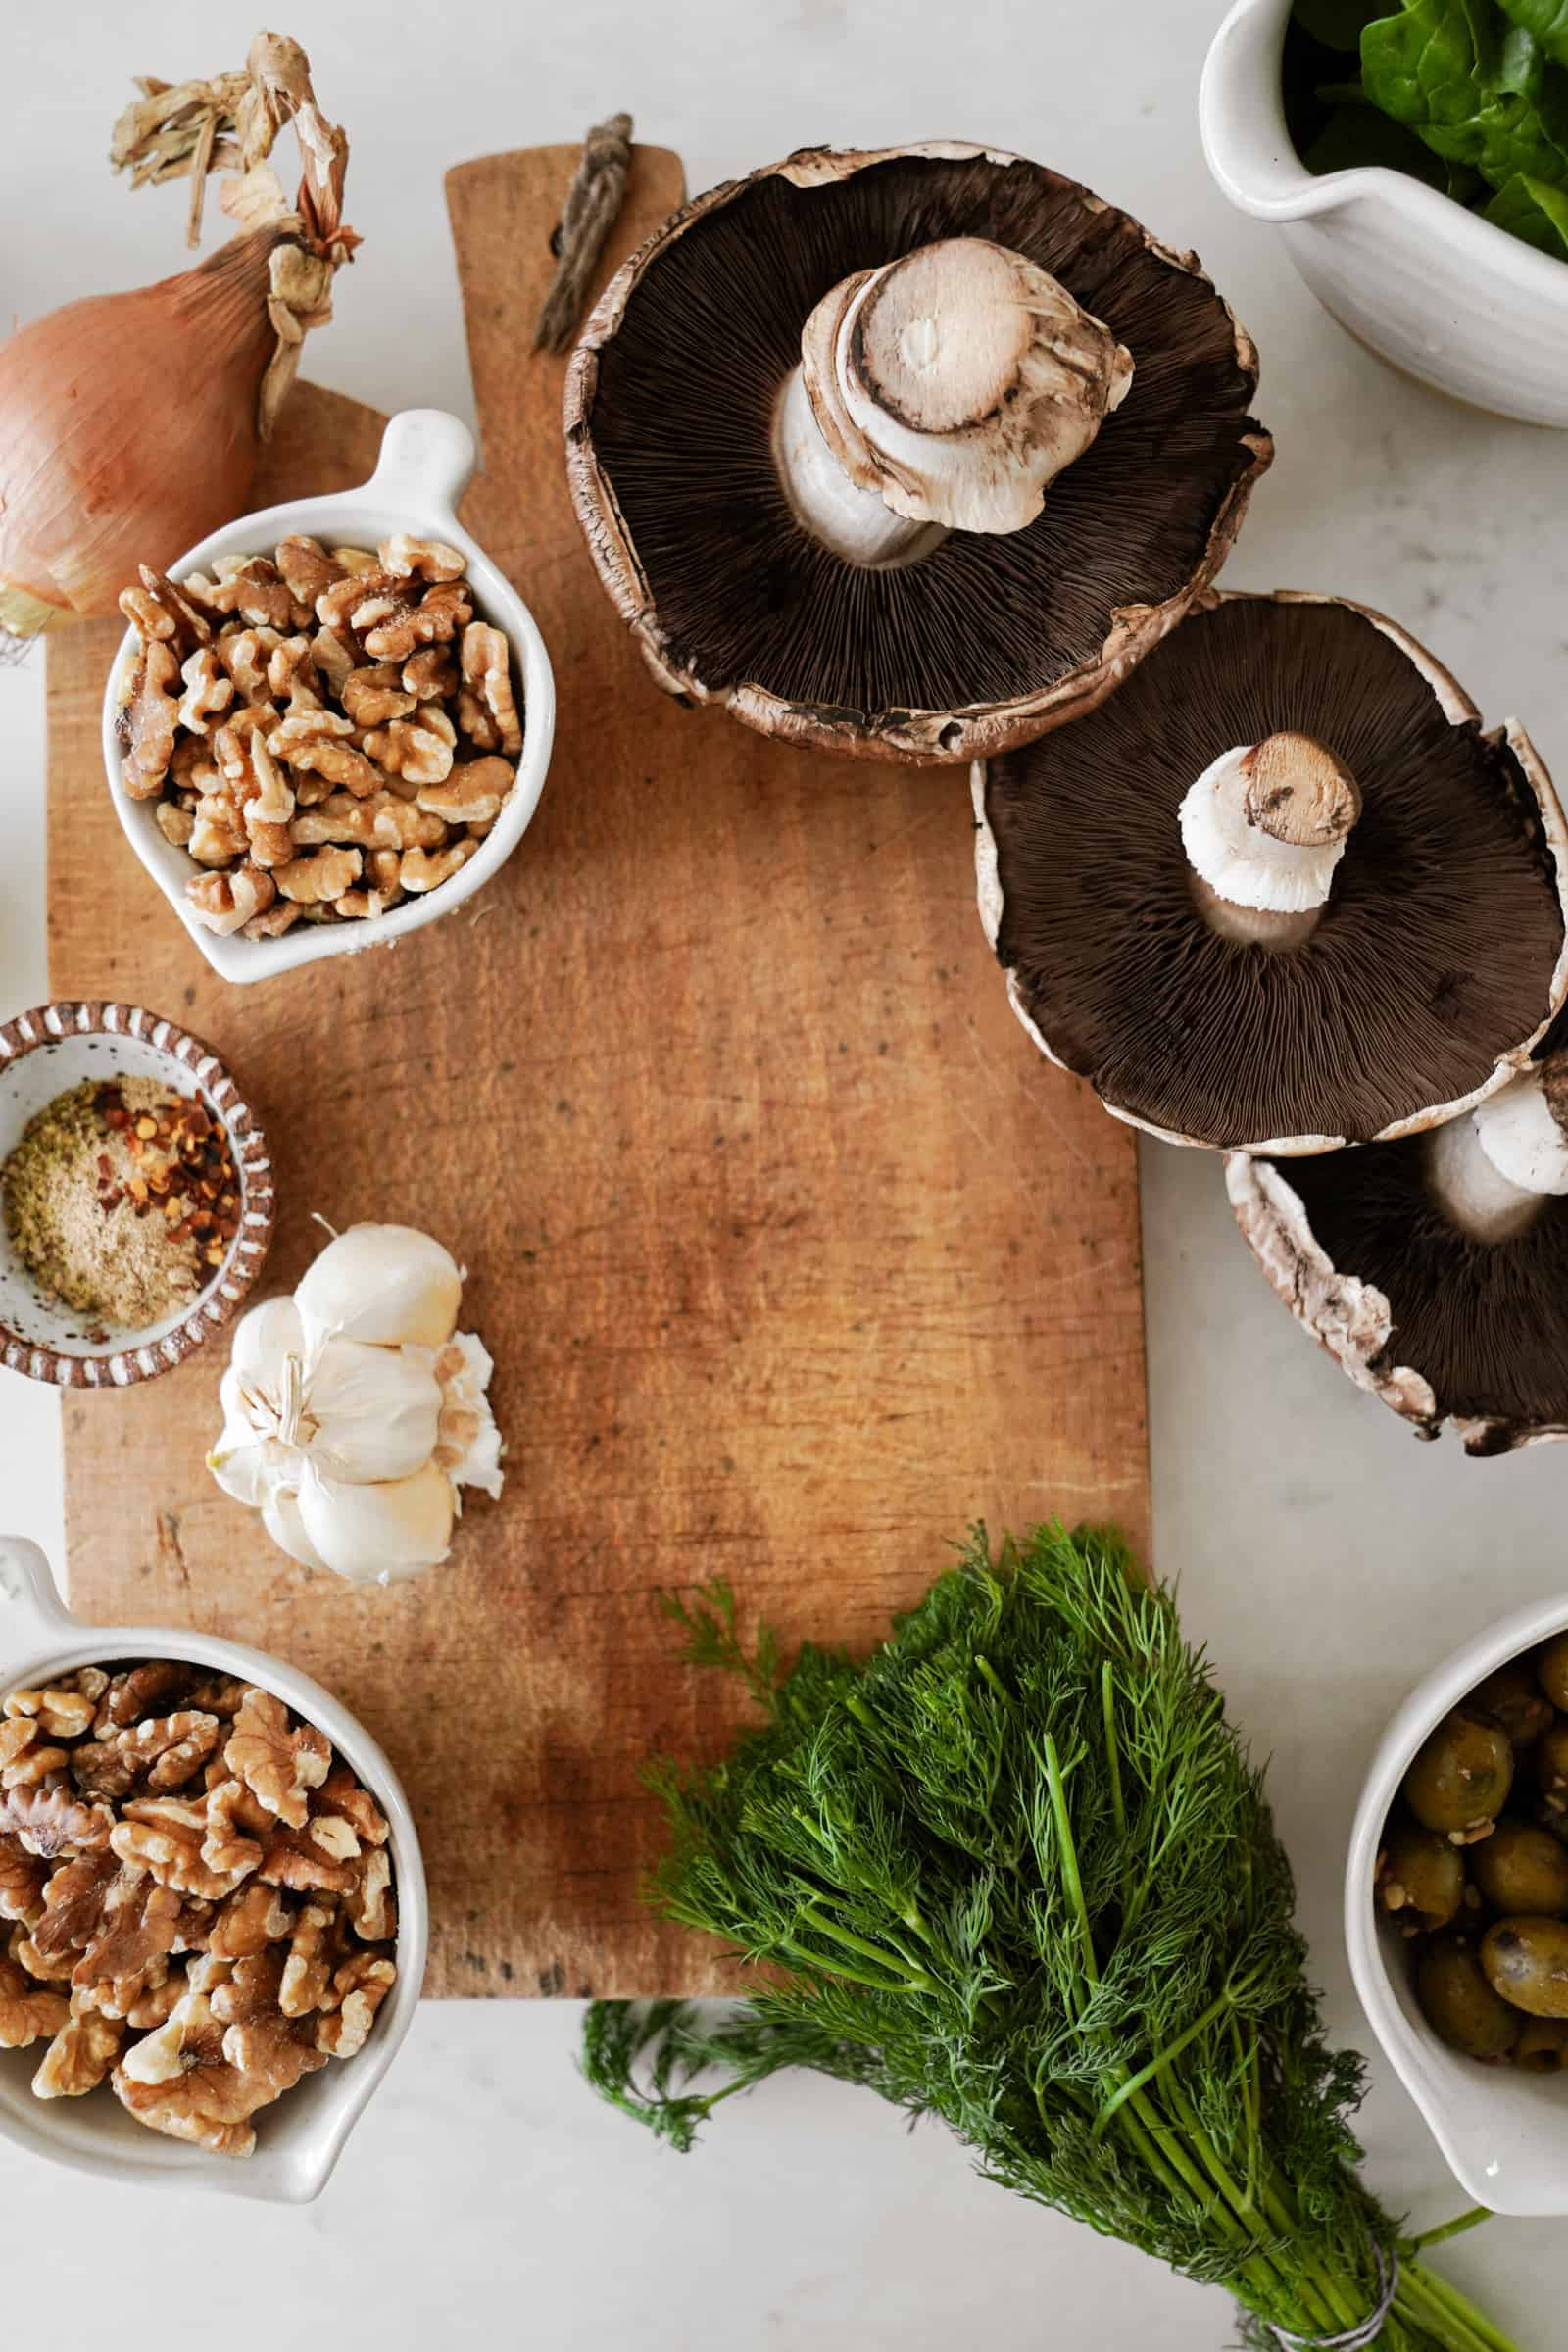 Fresh ingredients for Vegan Stuffed Portobello Mushrooms recipe